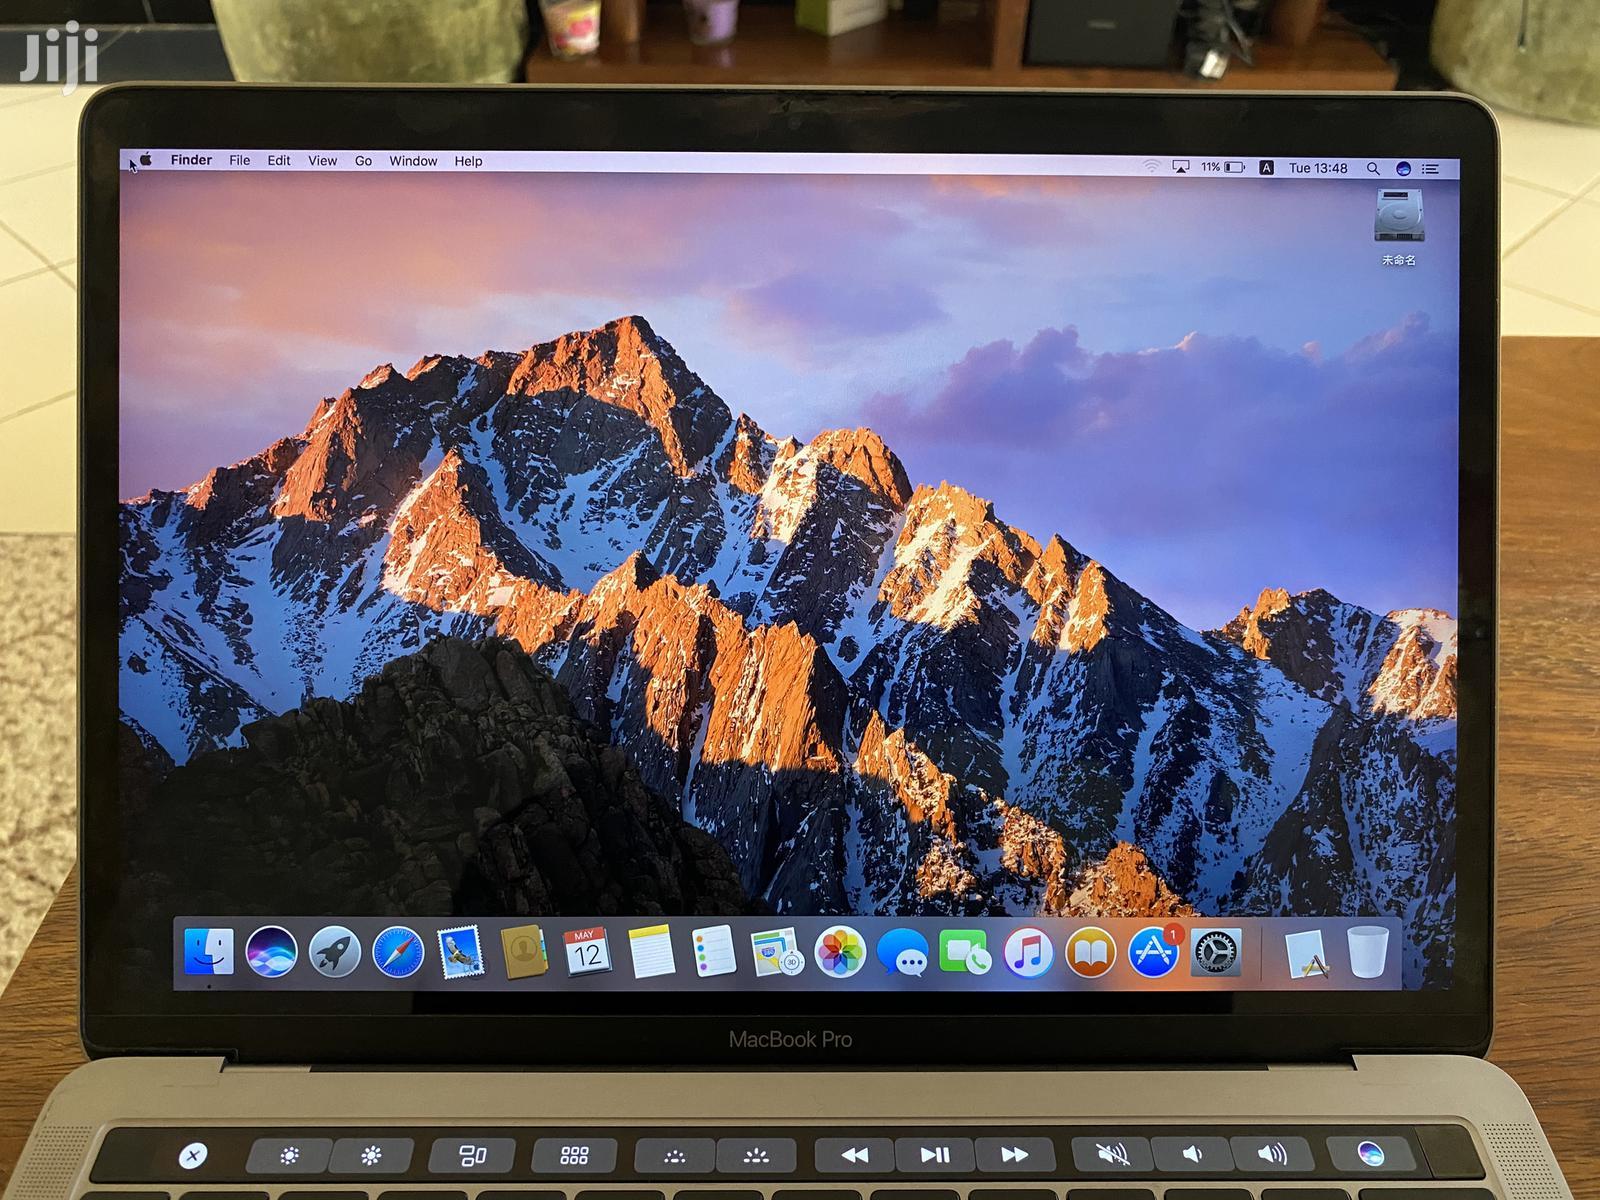 Laptop Apple MacBook Pro 8GB Intel Core I5 SSHD (Hybrid) 256GB | Laptops & Computers for sale in Kampala, Central Region, Uganda